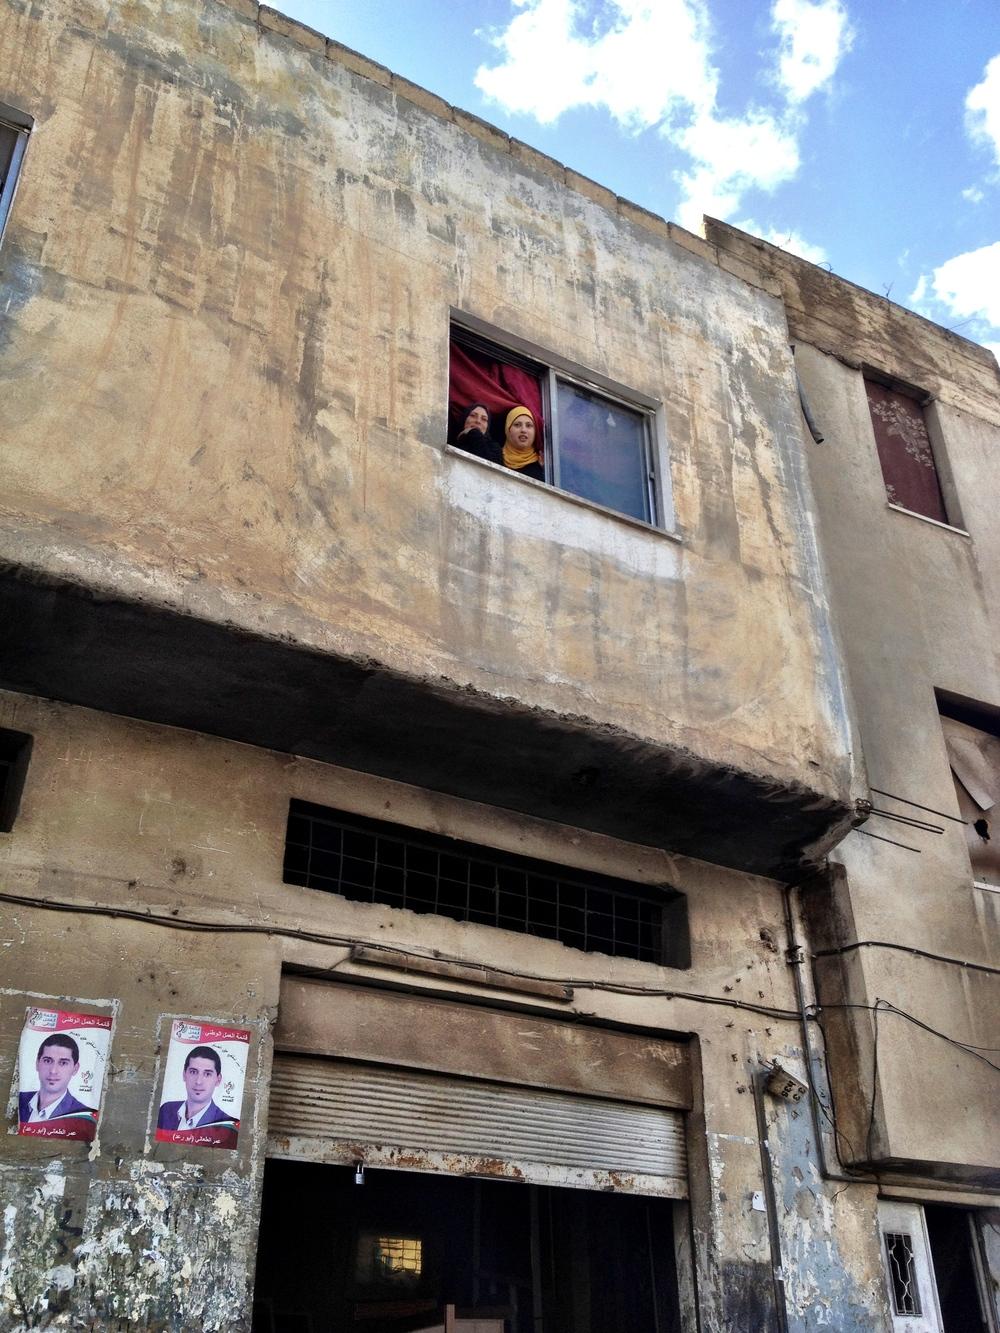 Jordan's hidden urban Syrian refugees